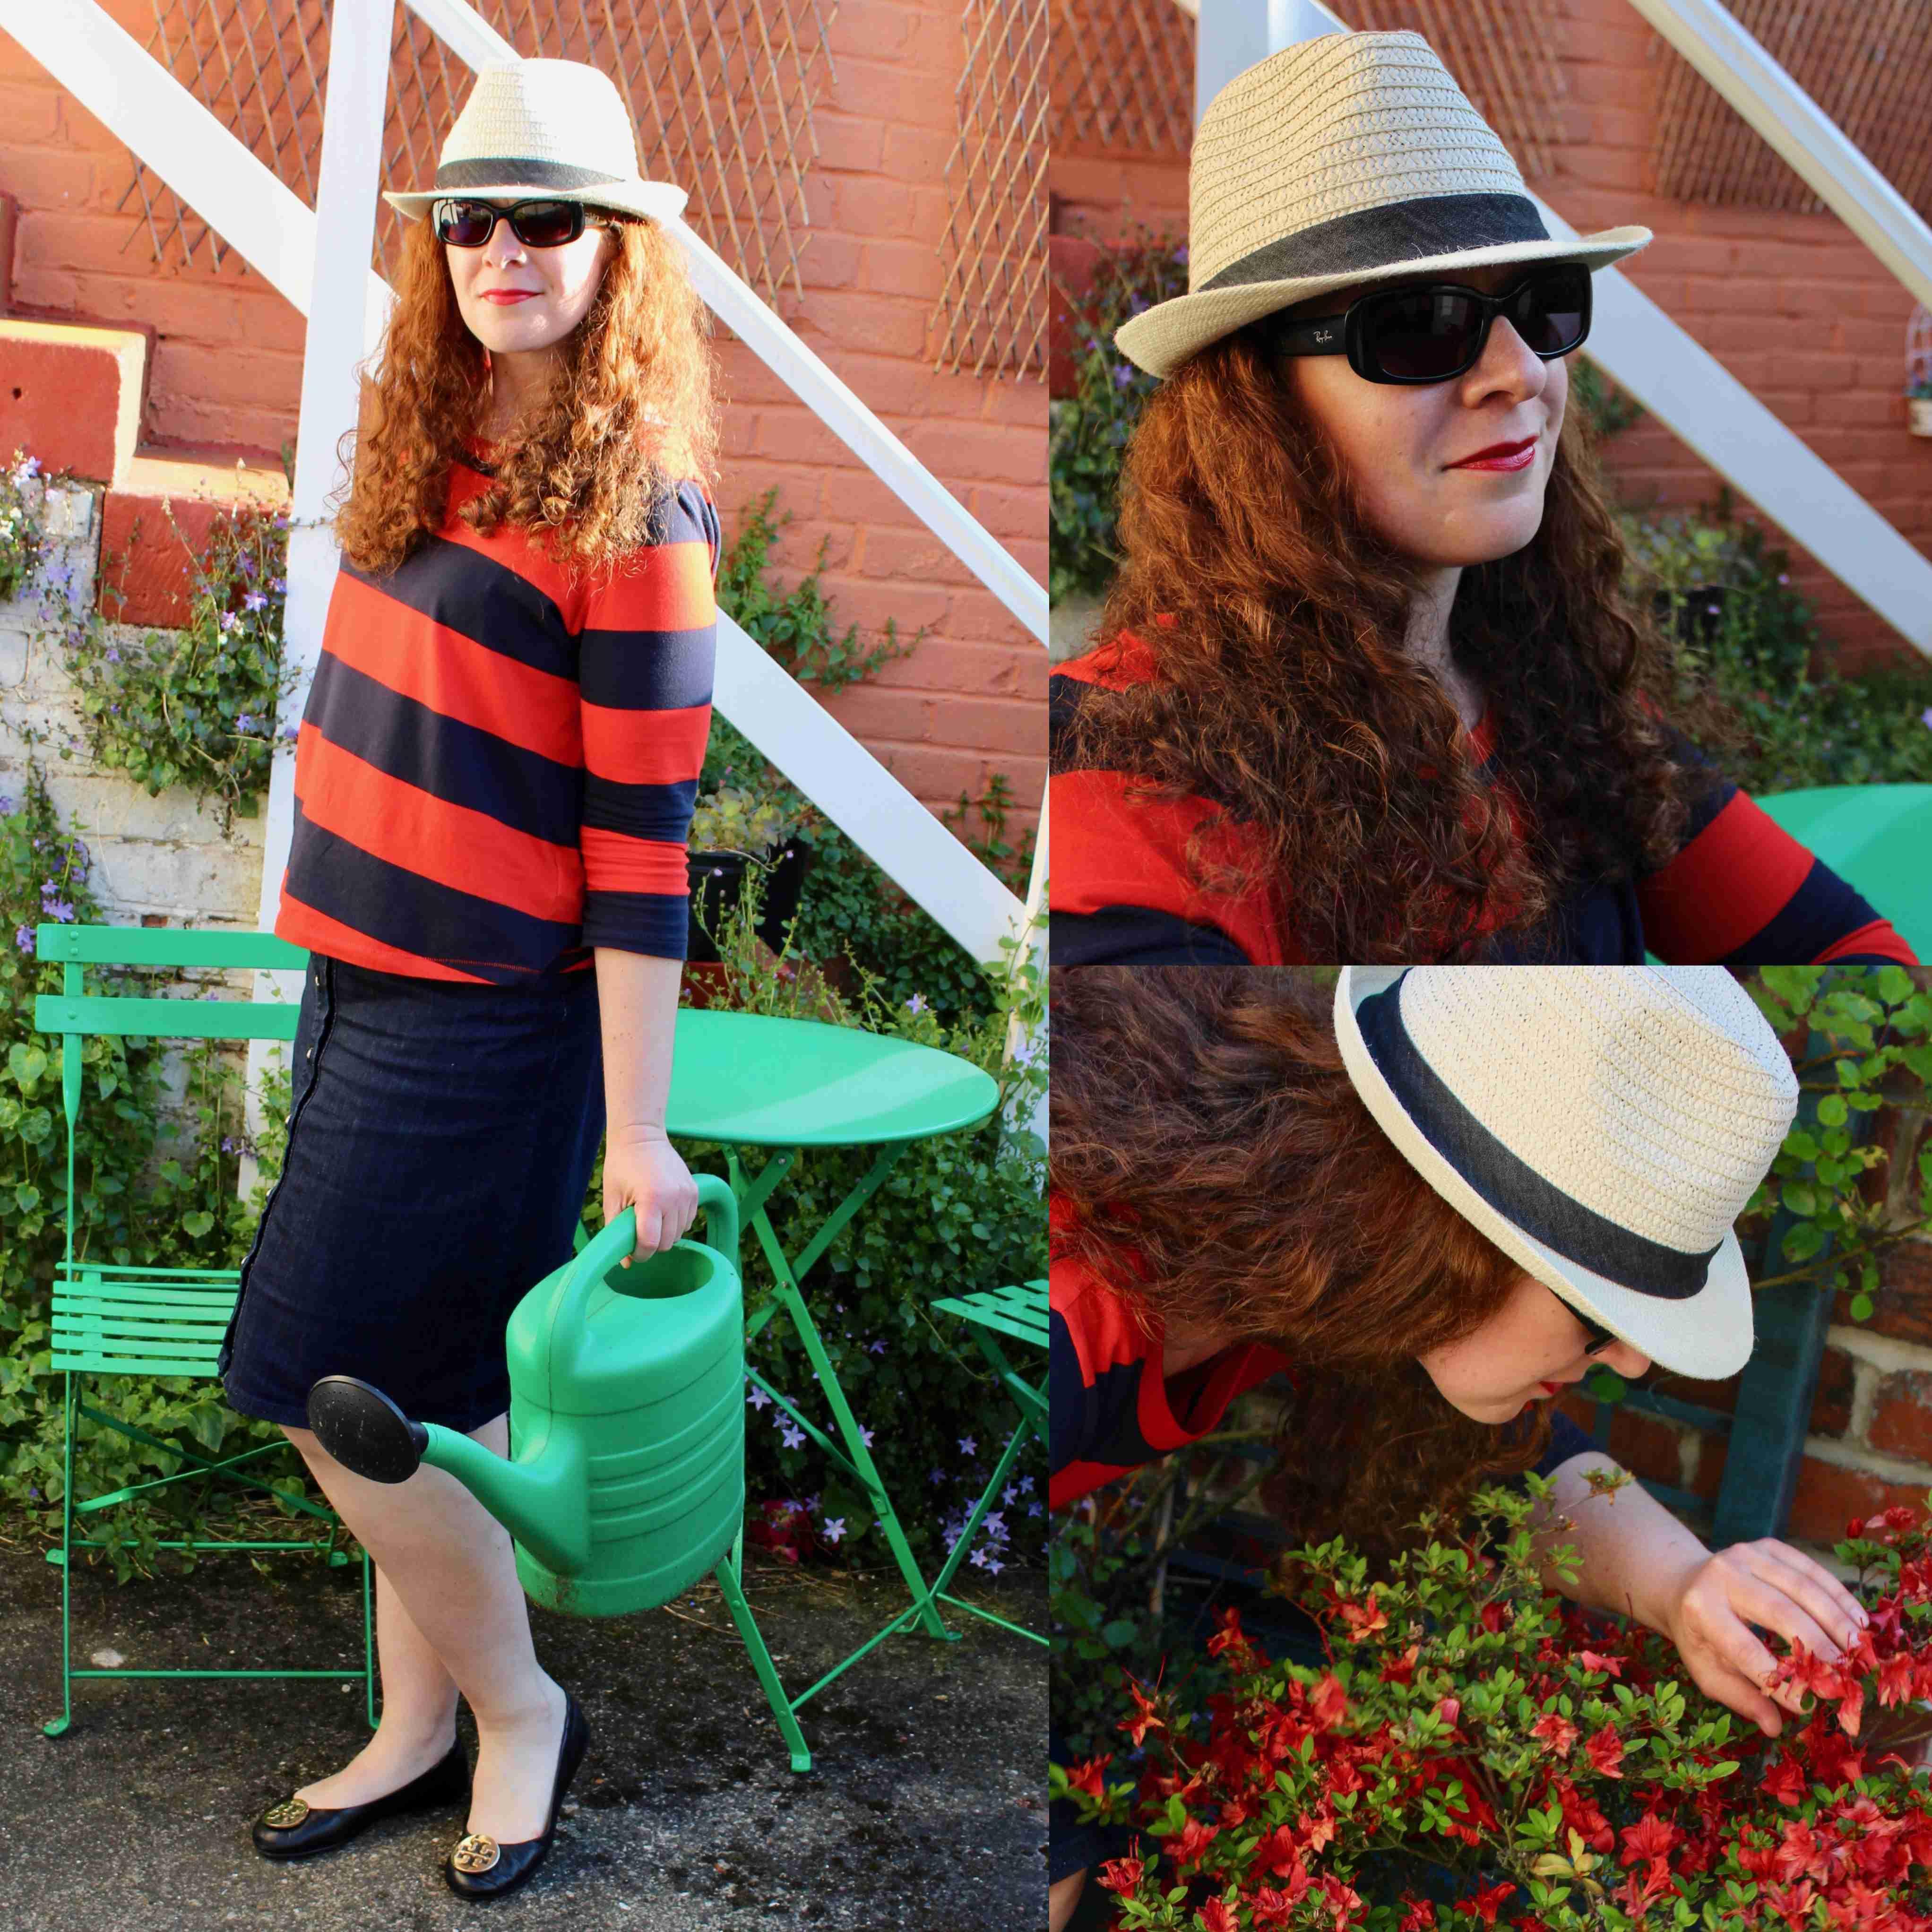 Ü40 Modebloggerin Tanja Garten Streifen T-shirt Jeansrock Fashion Mode